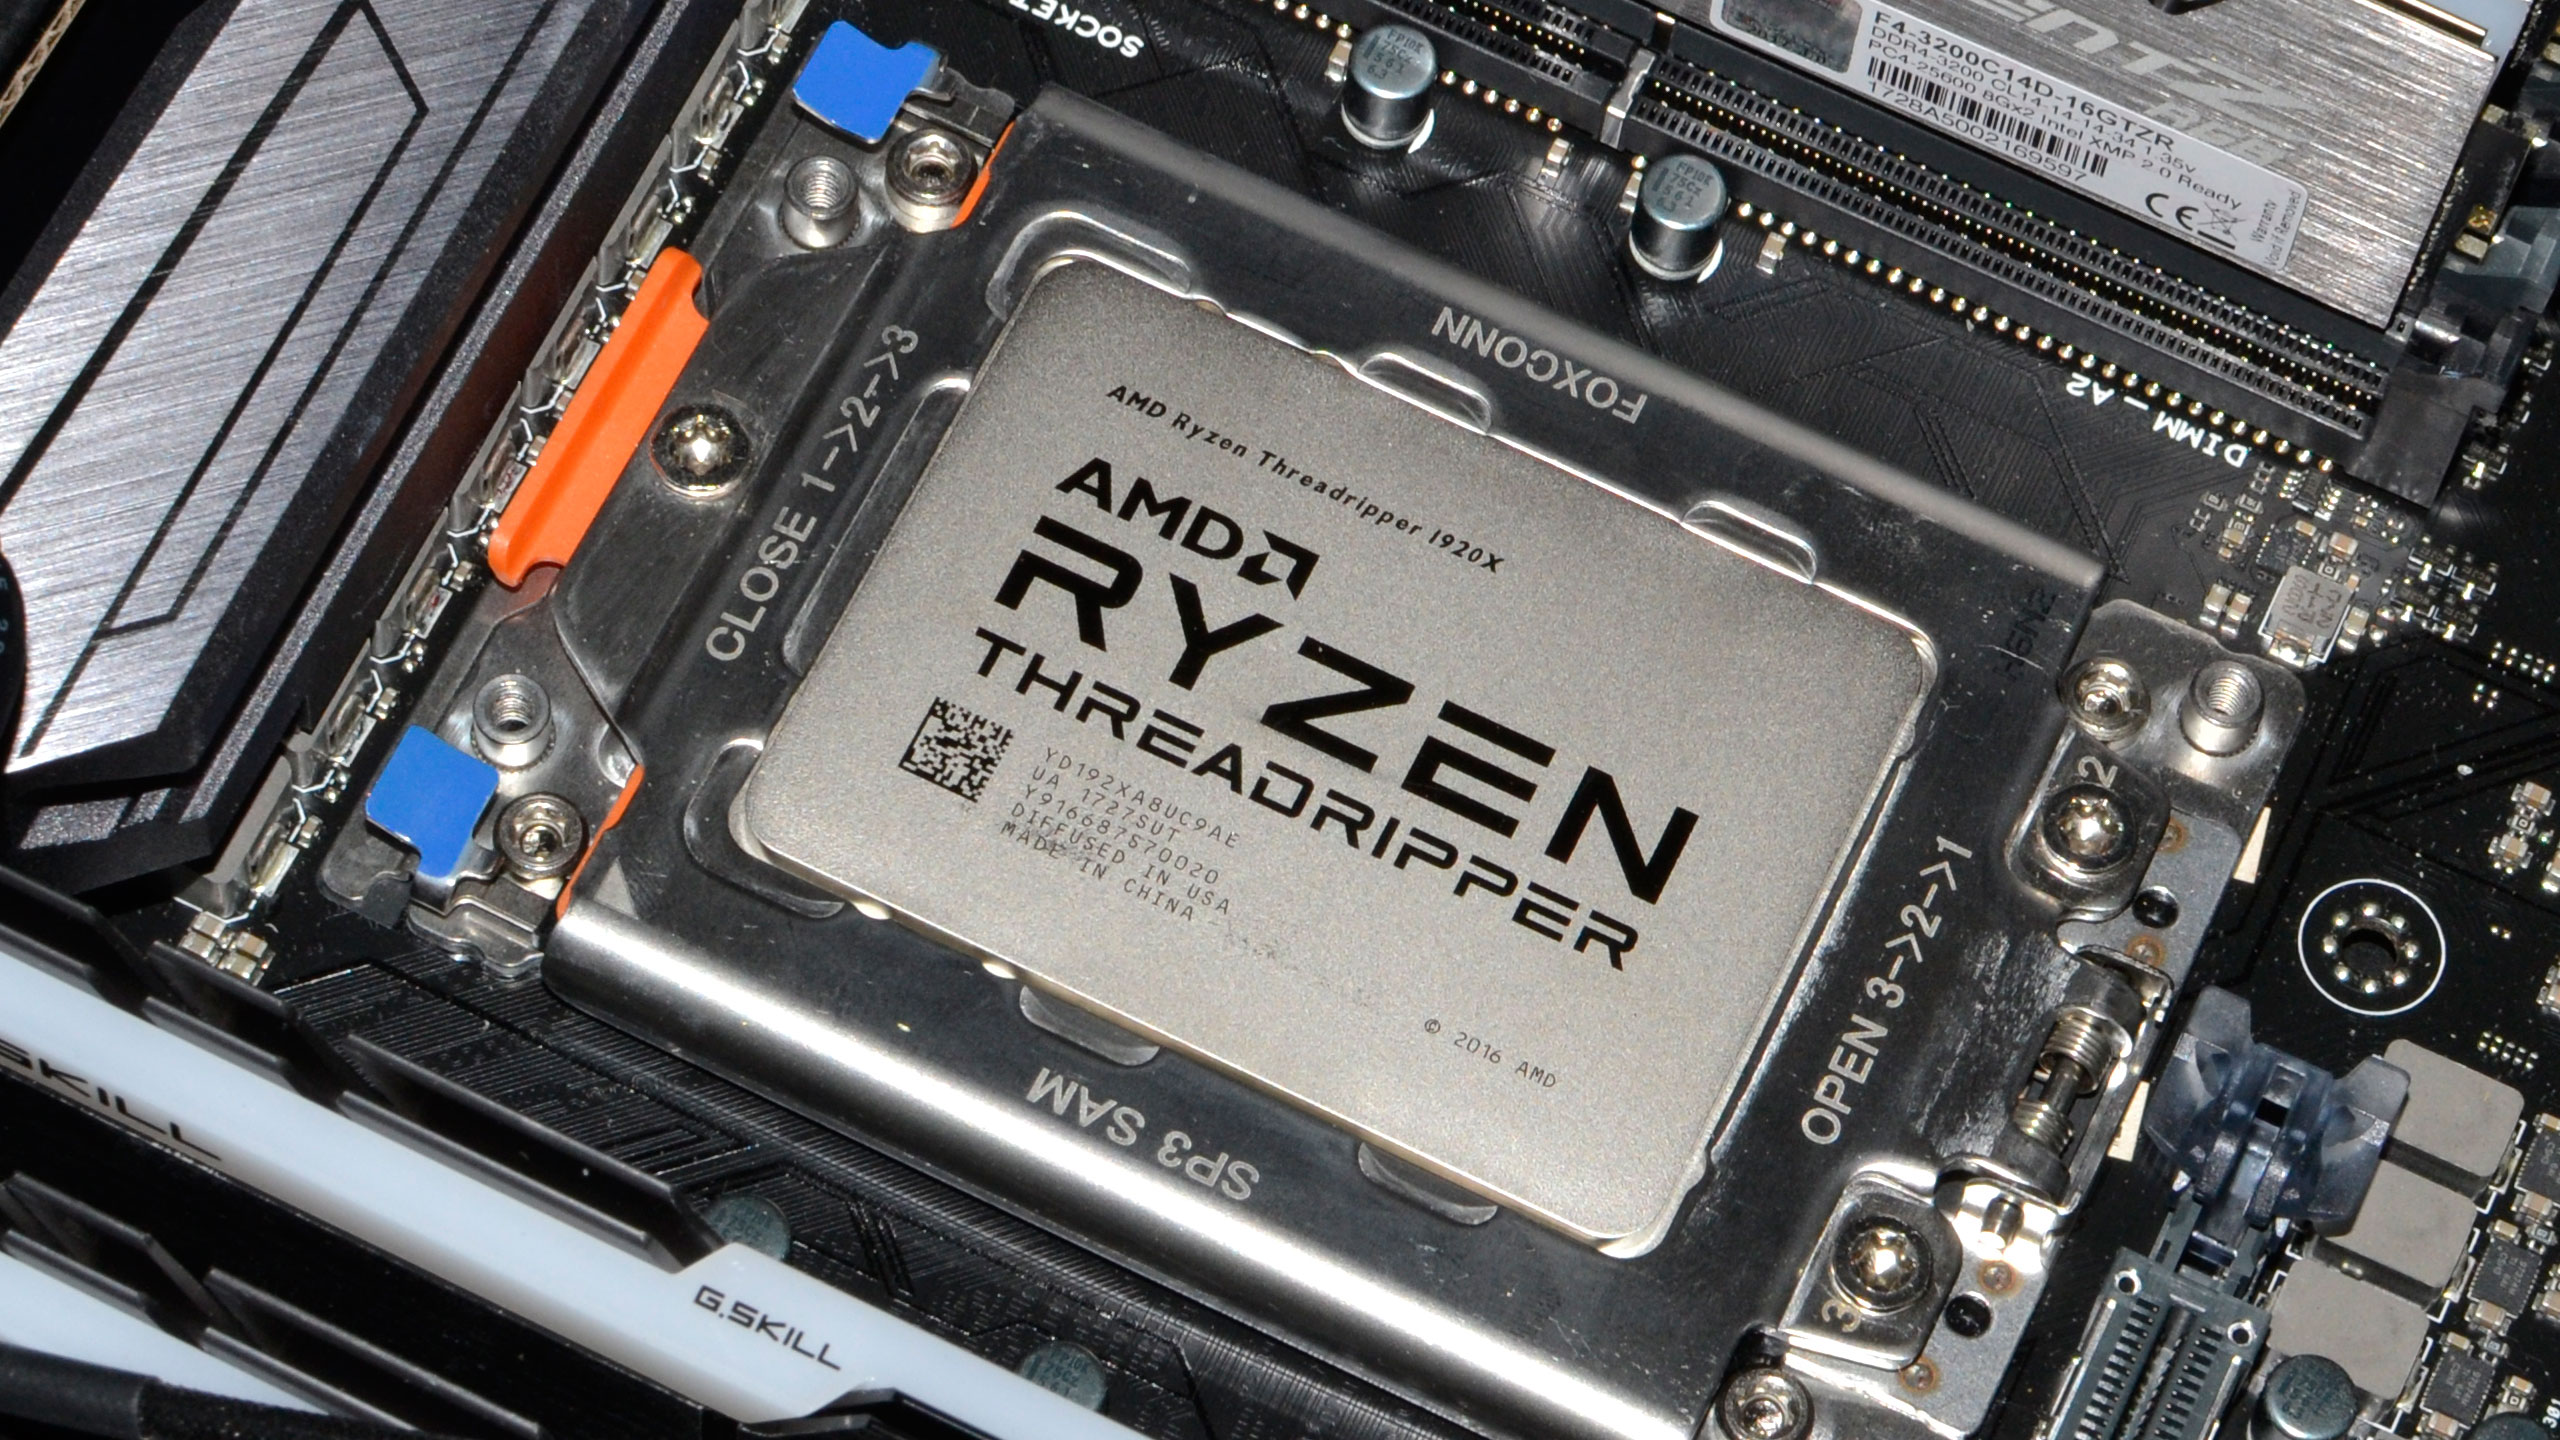 AMD engineers built Ryzen Threadripper in their spare time